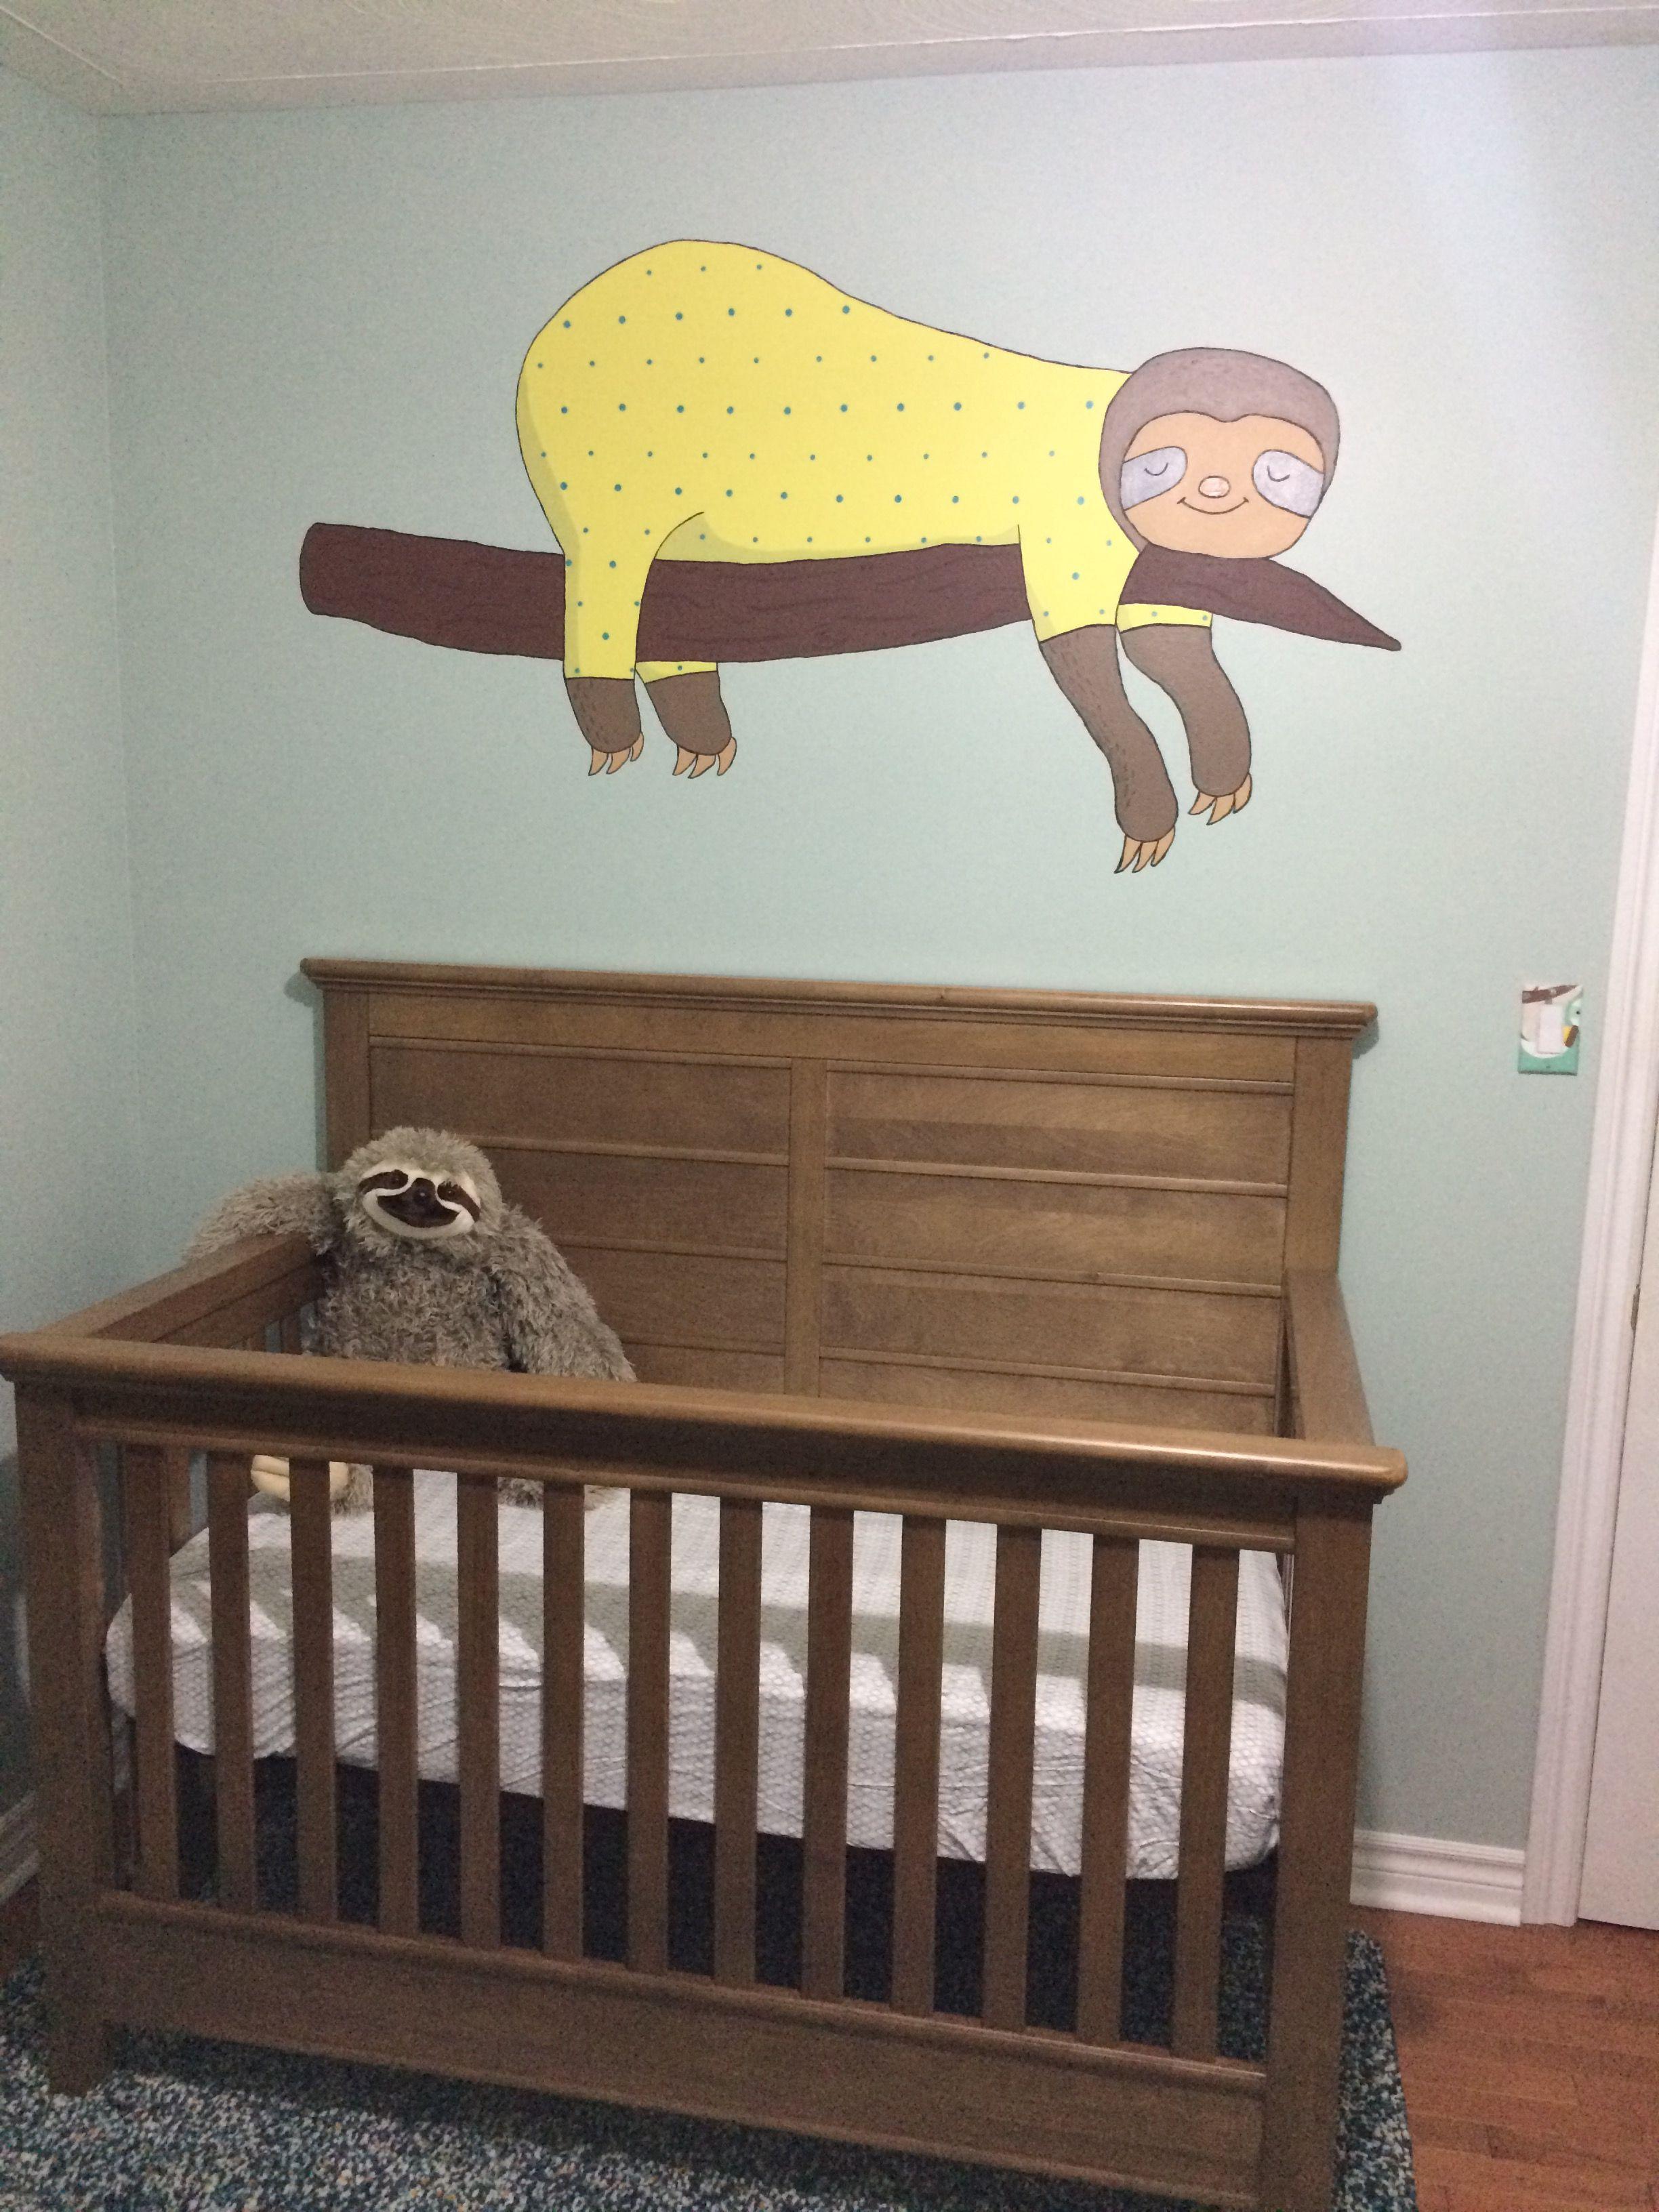 Sloth Mural For Baby S Nursery Crib